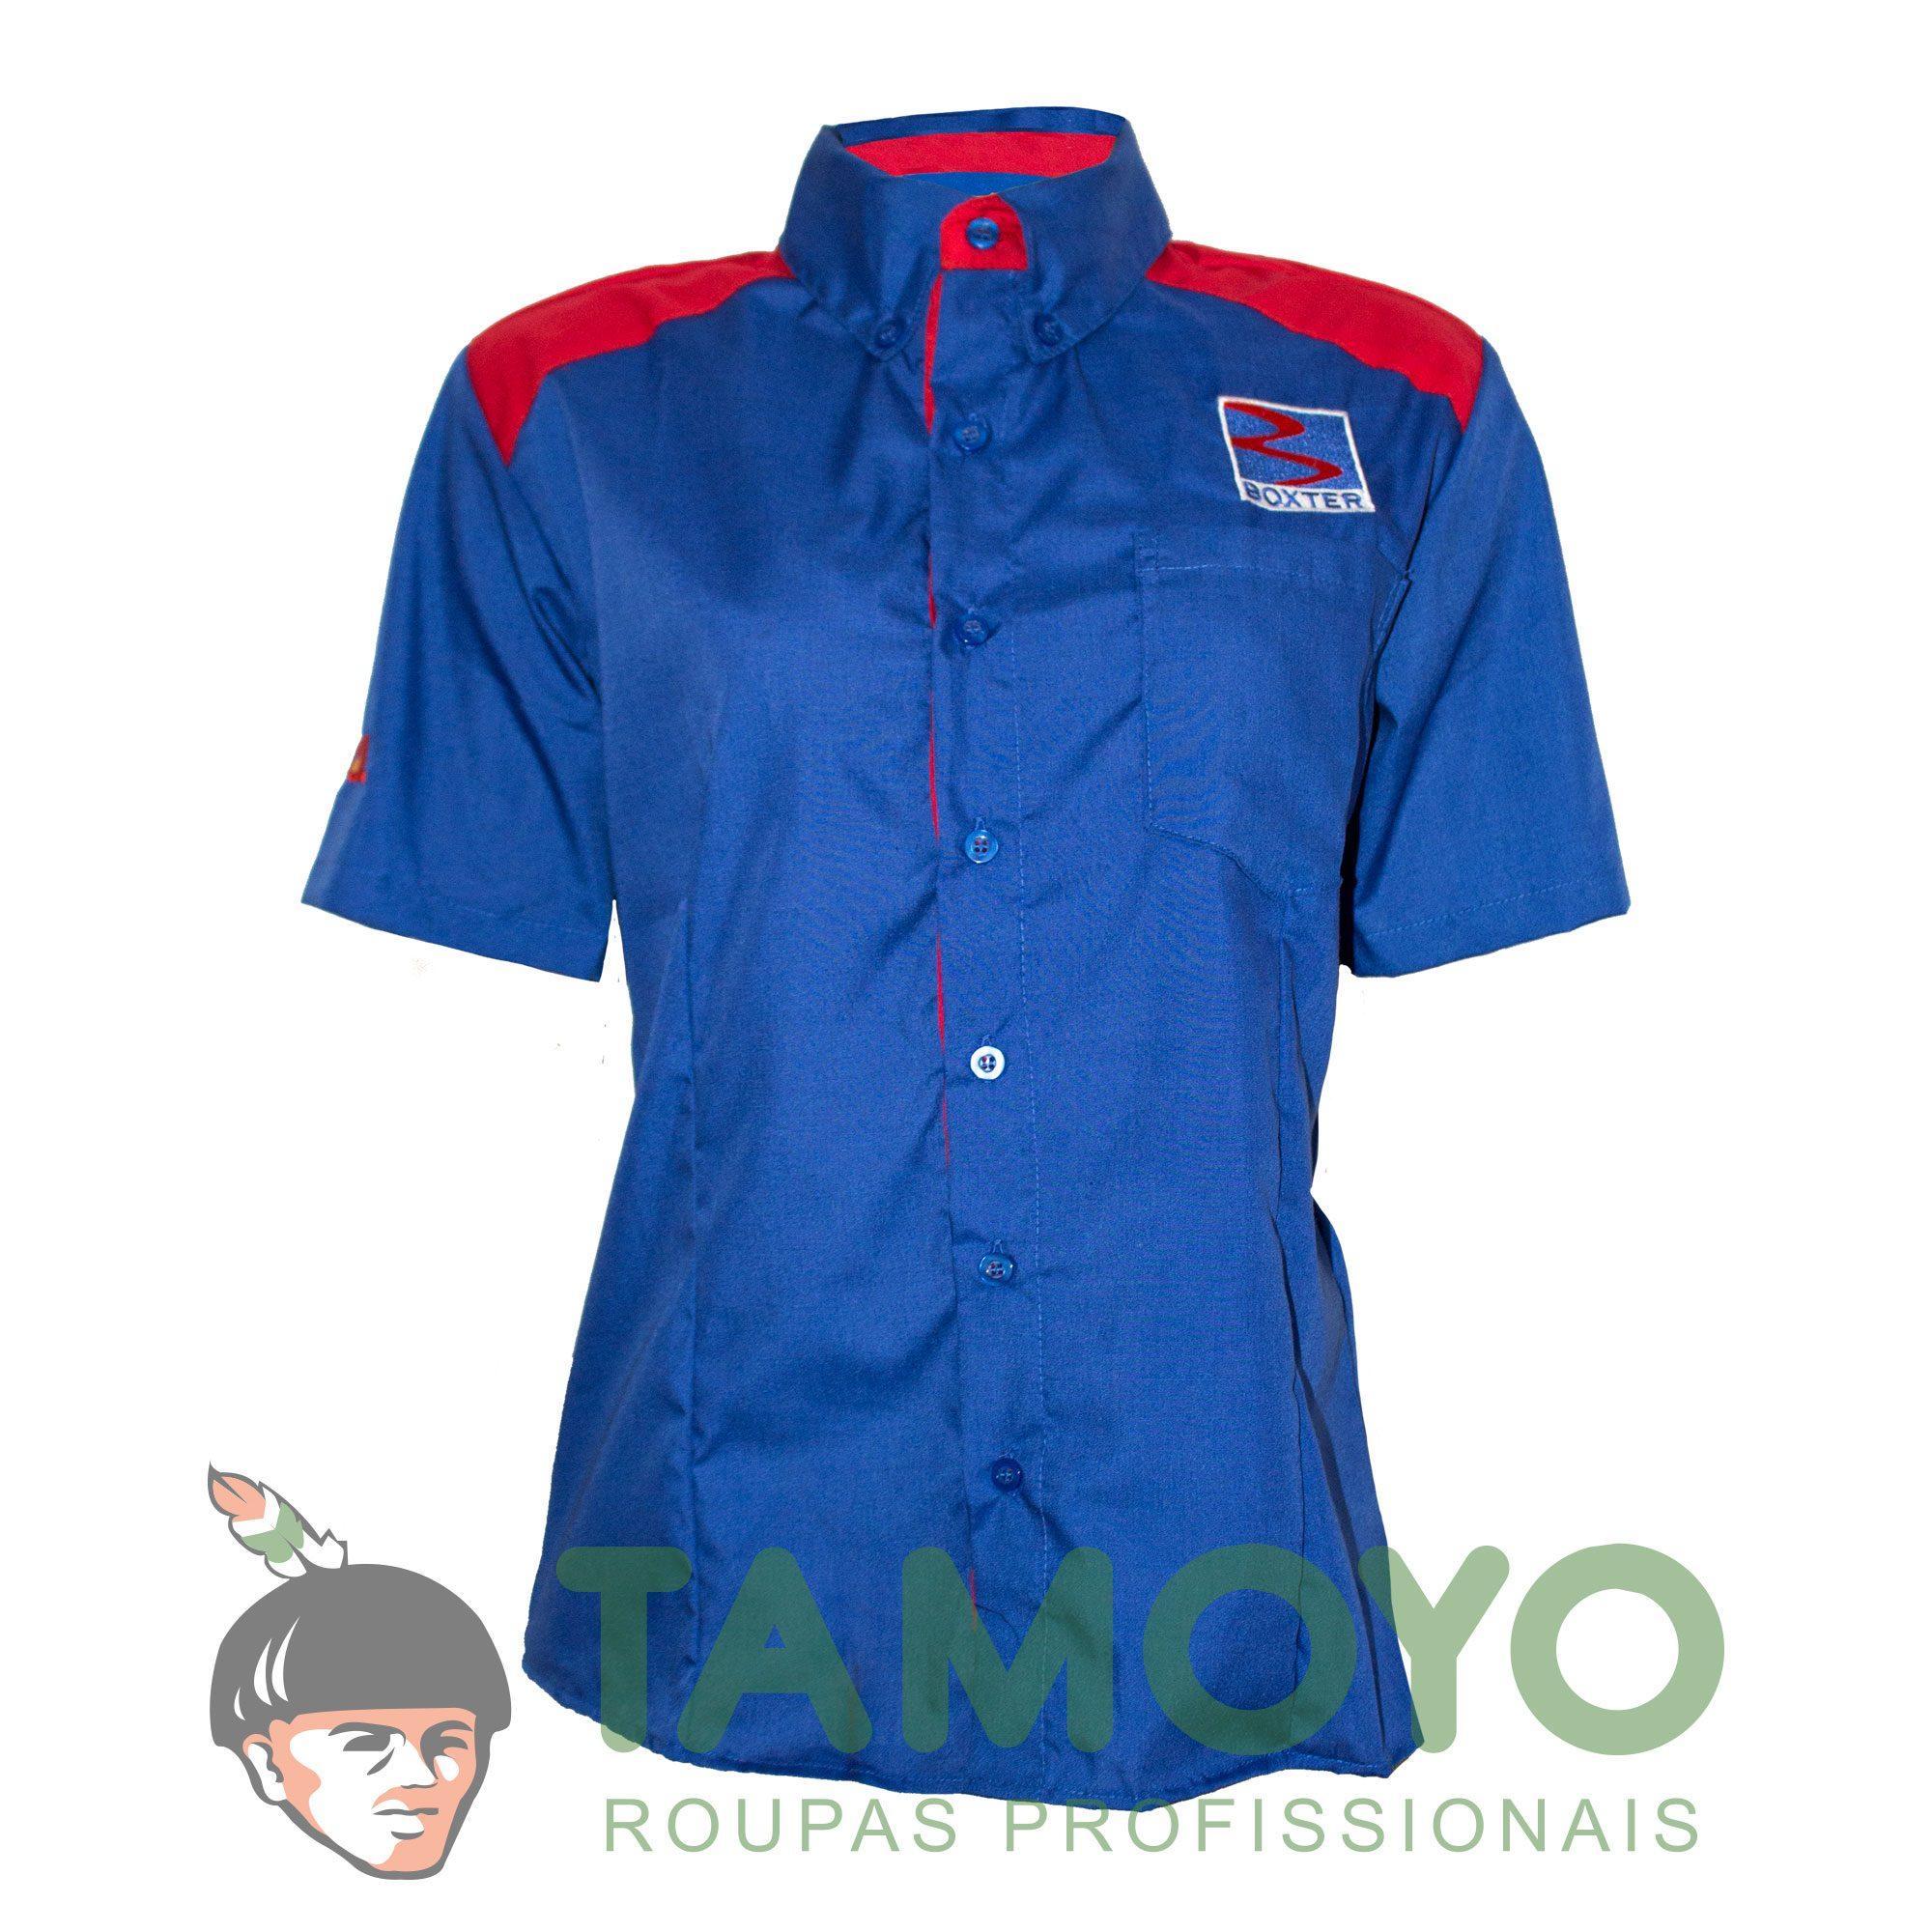 camisa-frentista-feminina-roupas-tamoyo-uniformes-profissionais-f